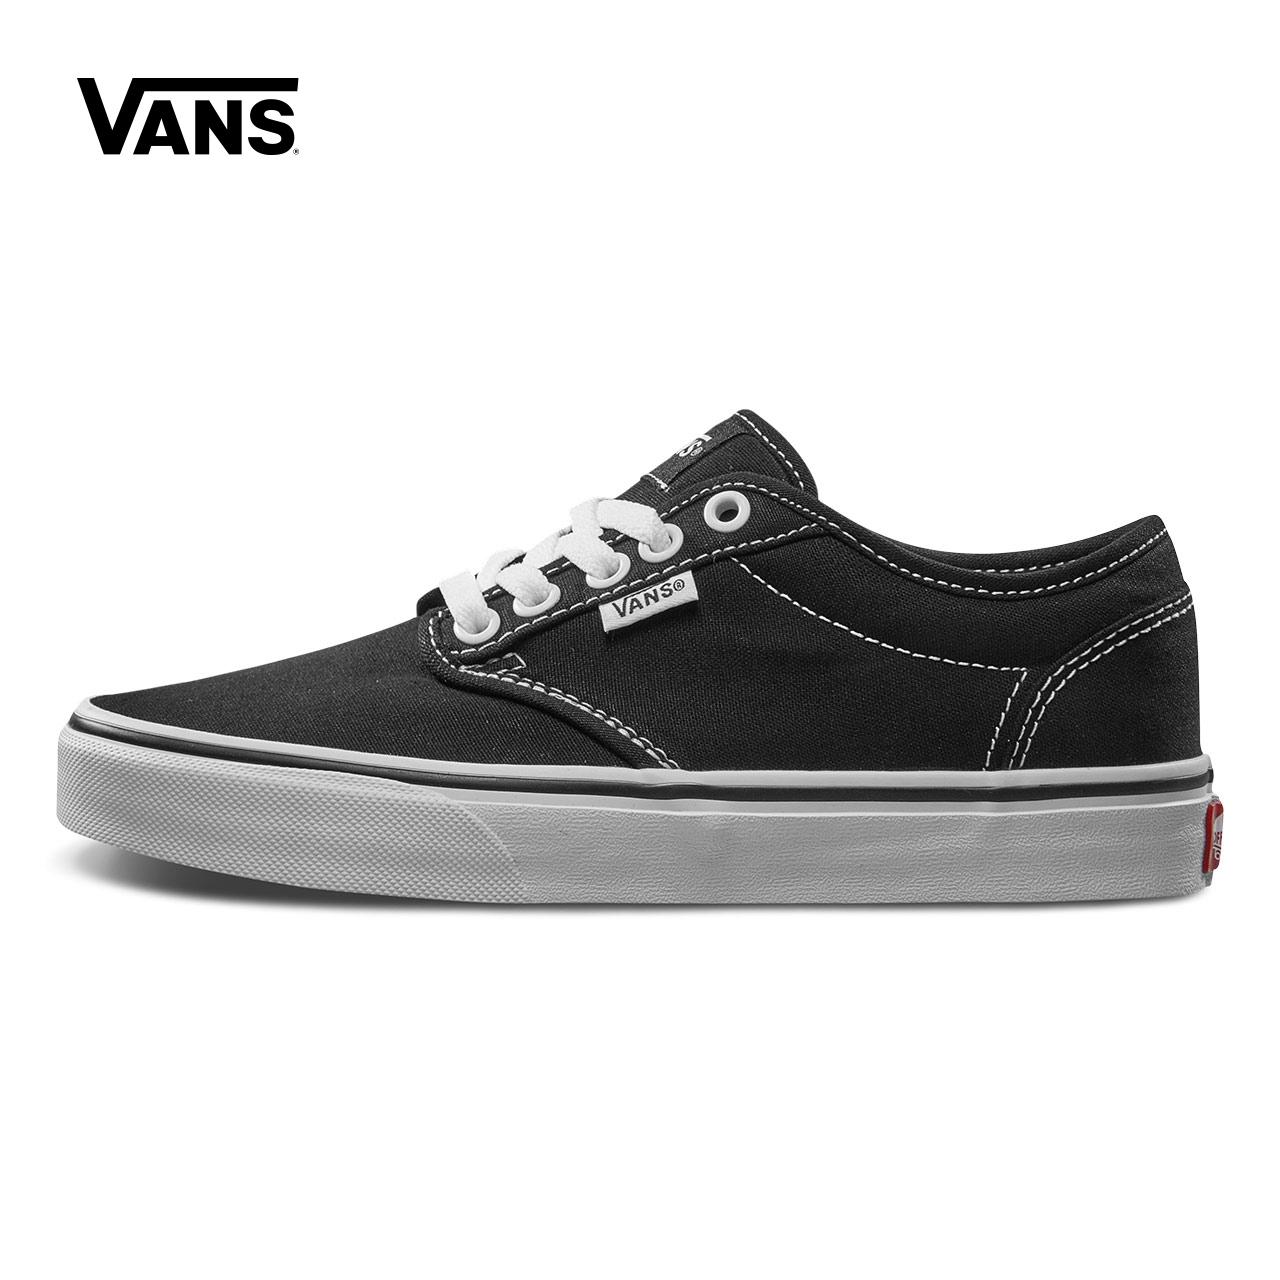 Vans范斯 运动休闲系列 帆布鞋 低帮经典款女子官方正品